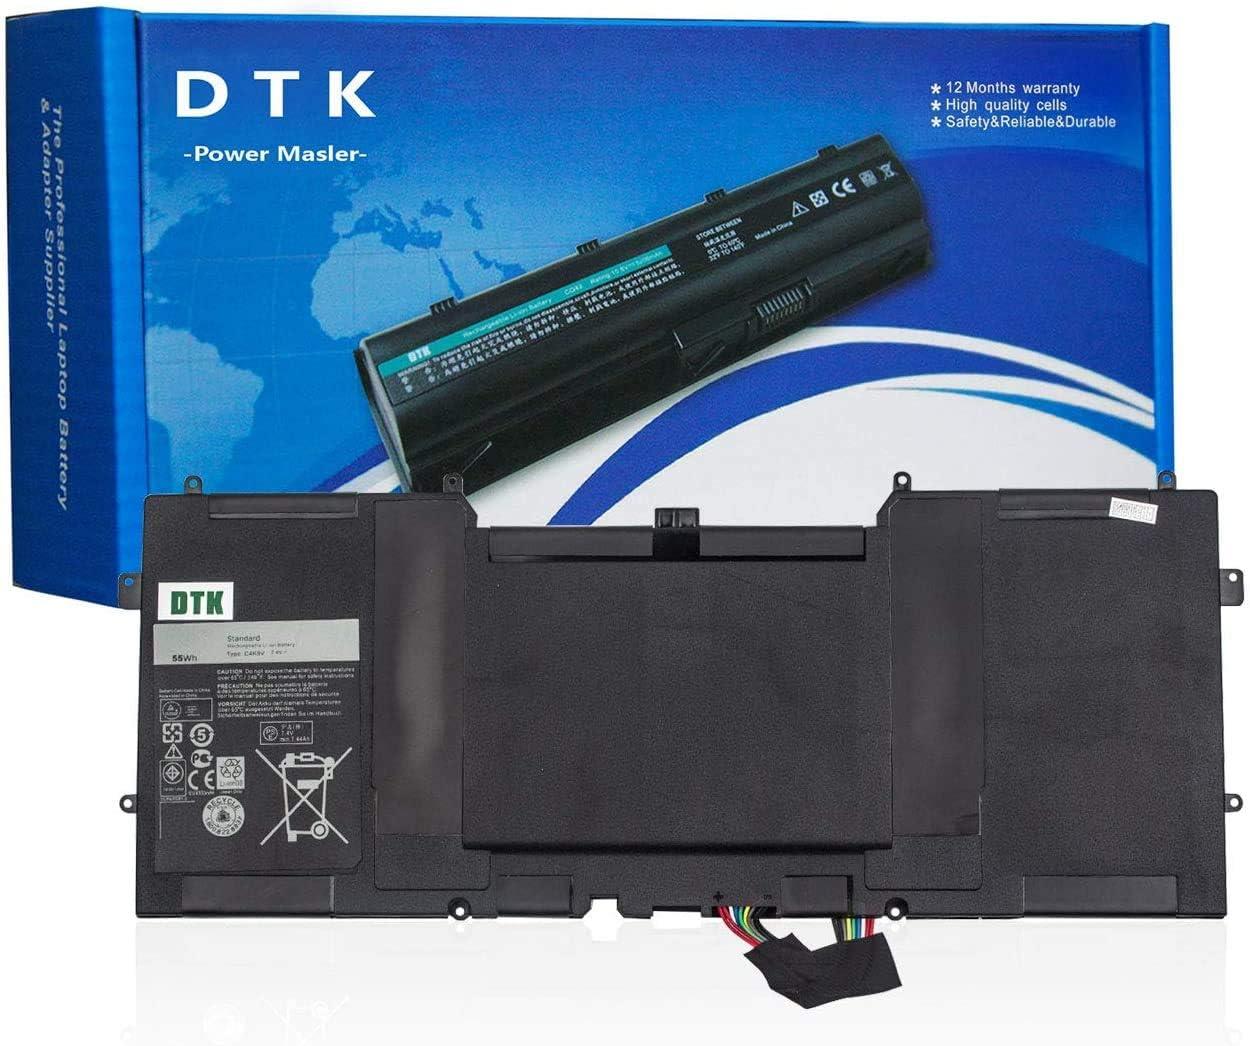 DTK C4K9V Laptop Battery for Dell XPS 13 XPS 13D XPS 13R XPS 13Z XPS 12 XPS 12D Series Replacement C PKH18 Y9N00 489XN 0Y9N00 0PKH18 7.4V 55Wh